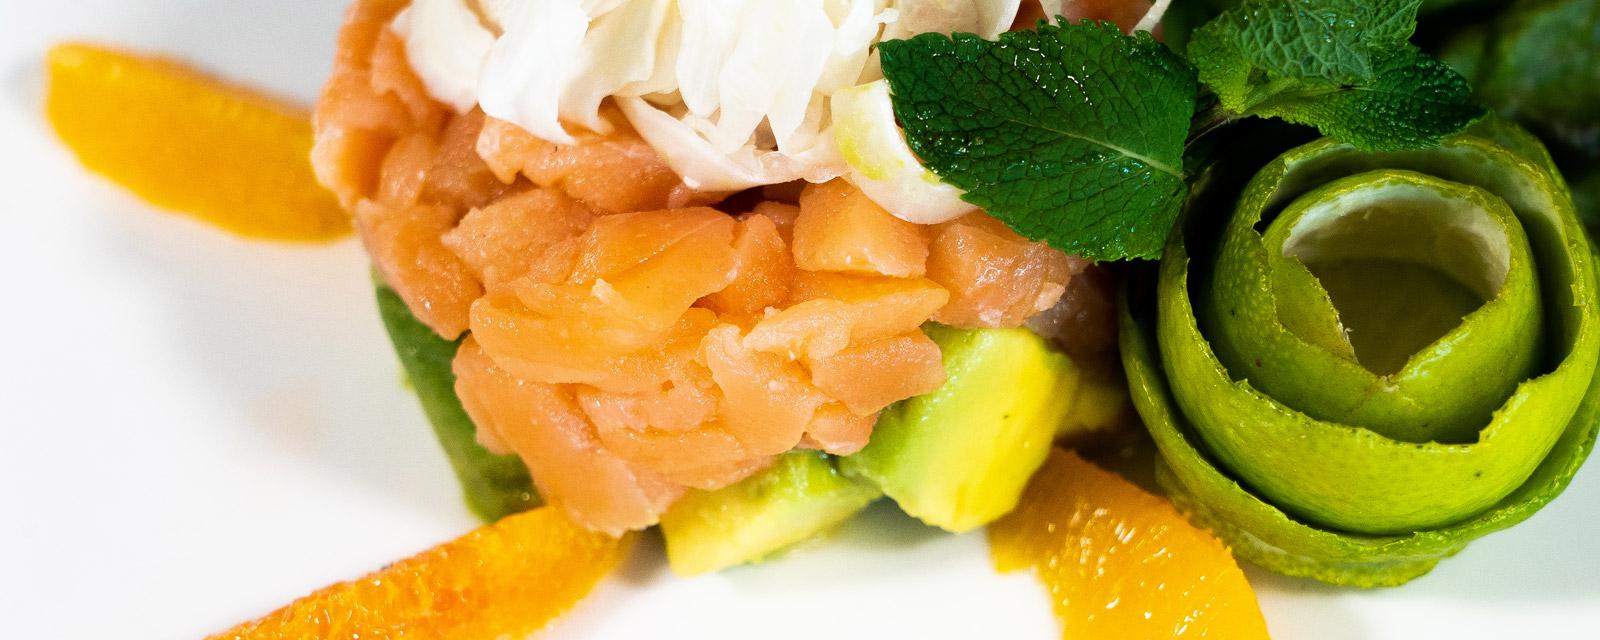 Food2_CateringIdea